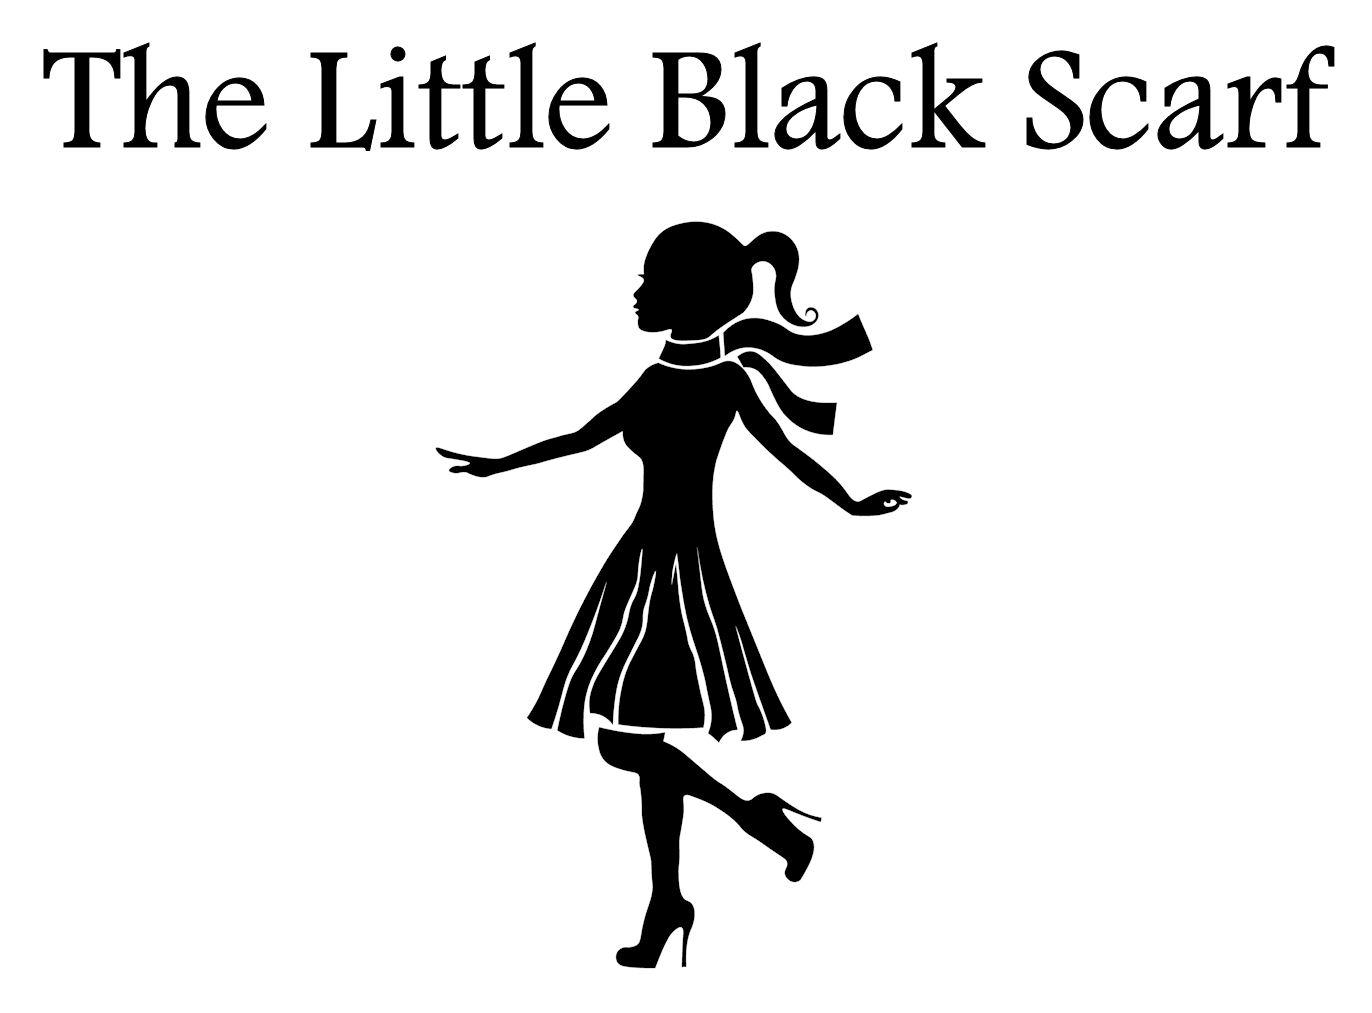 https://www.etsy.com/shop/TheLittleBlackScarf